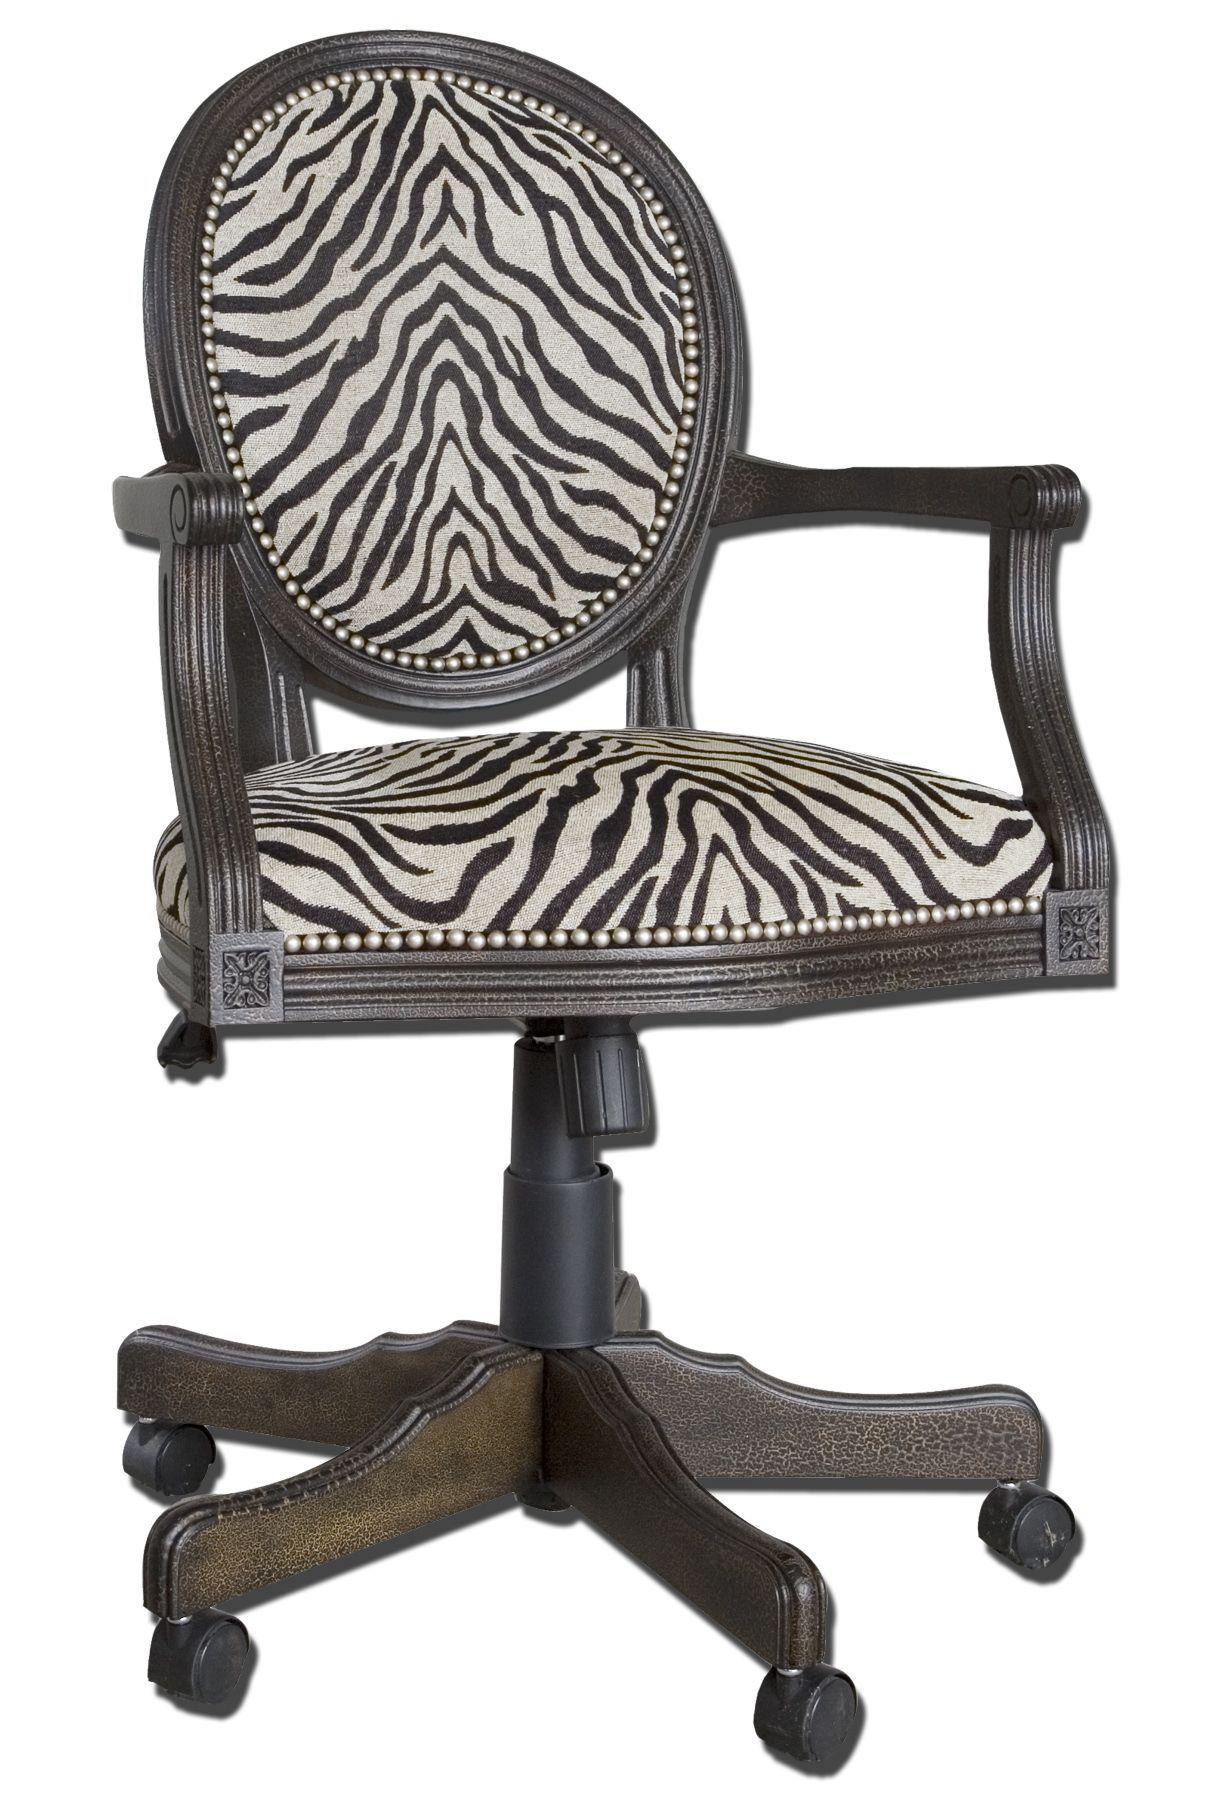 Decoration News: Desk Chairs Decorative